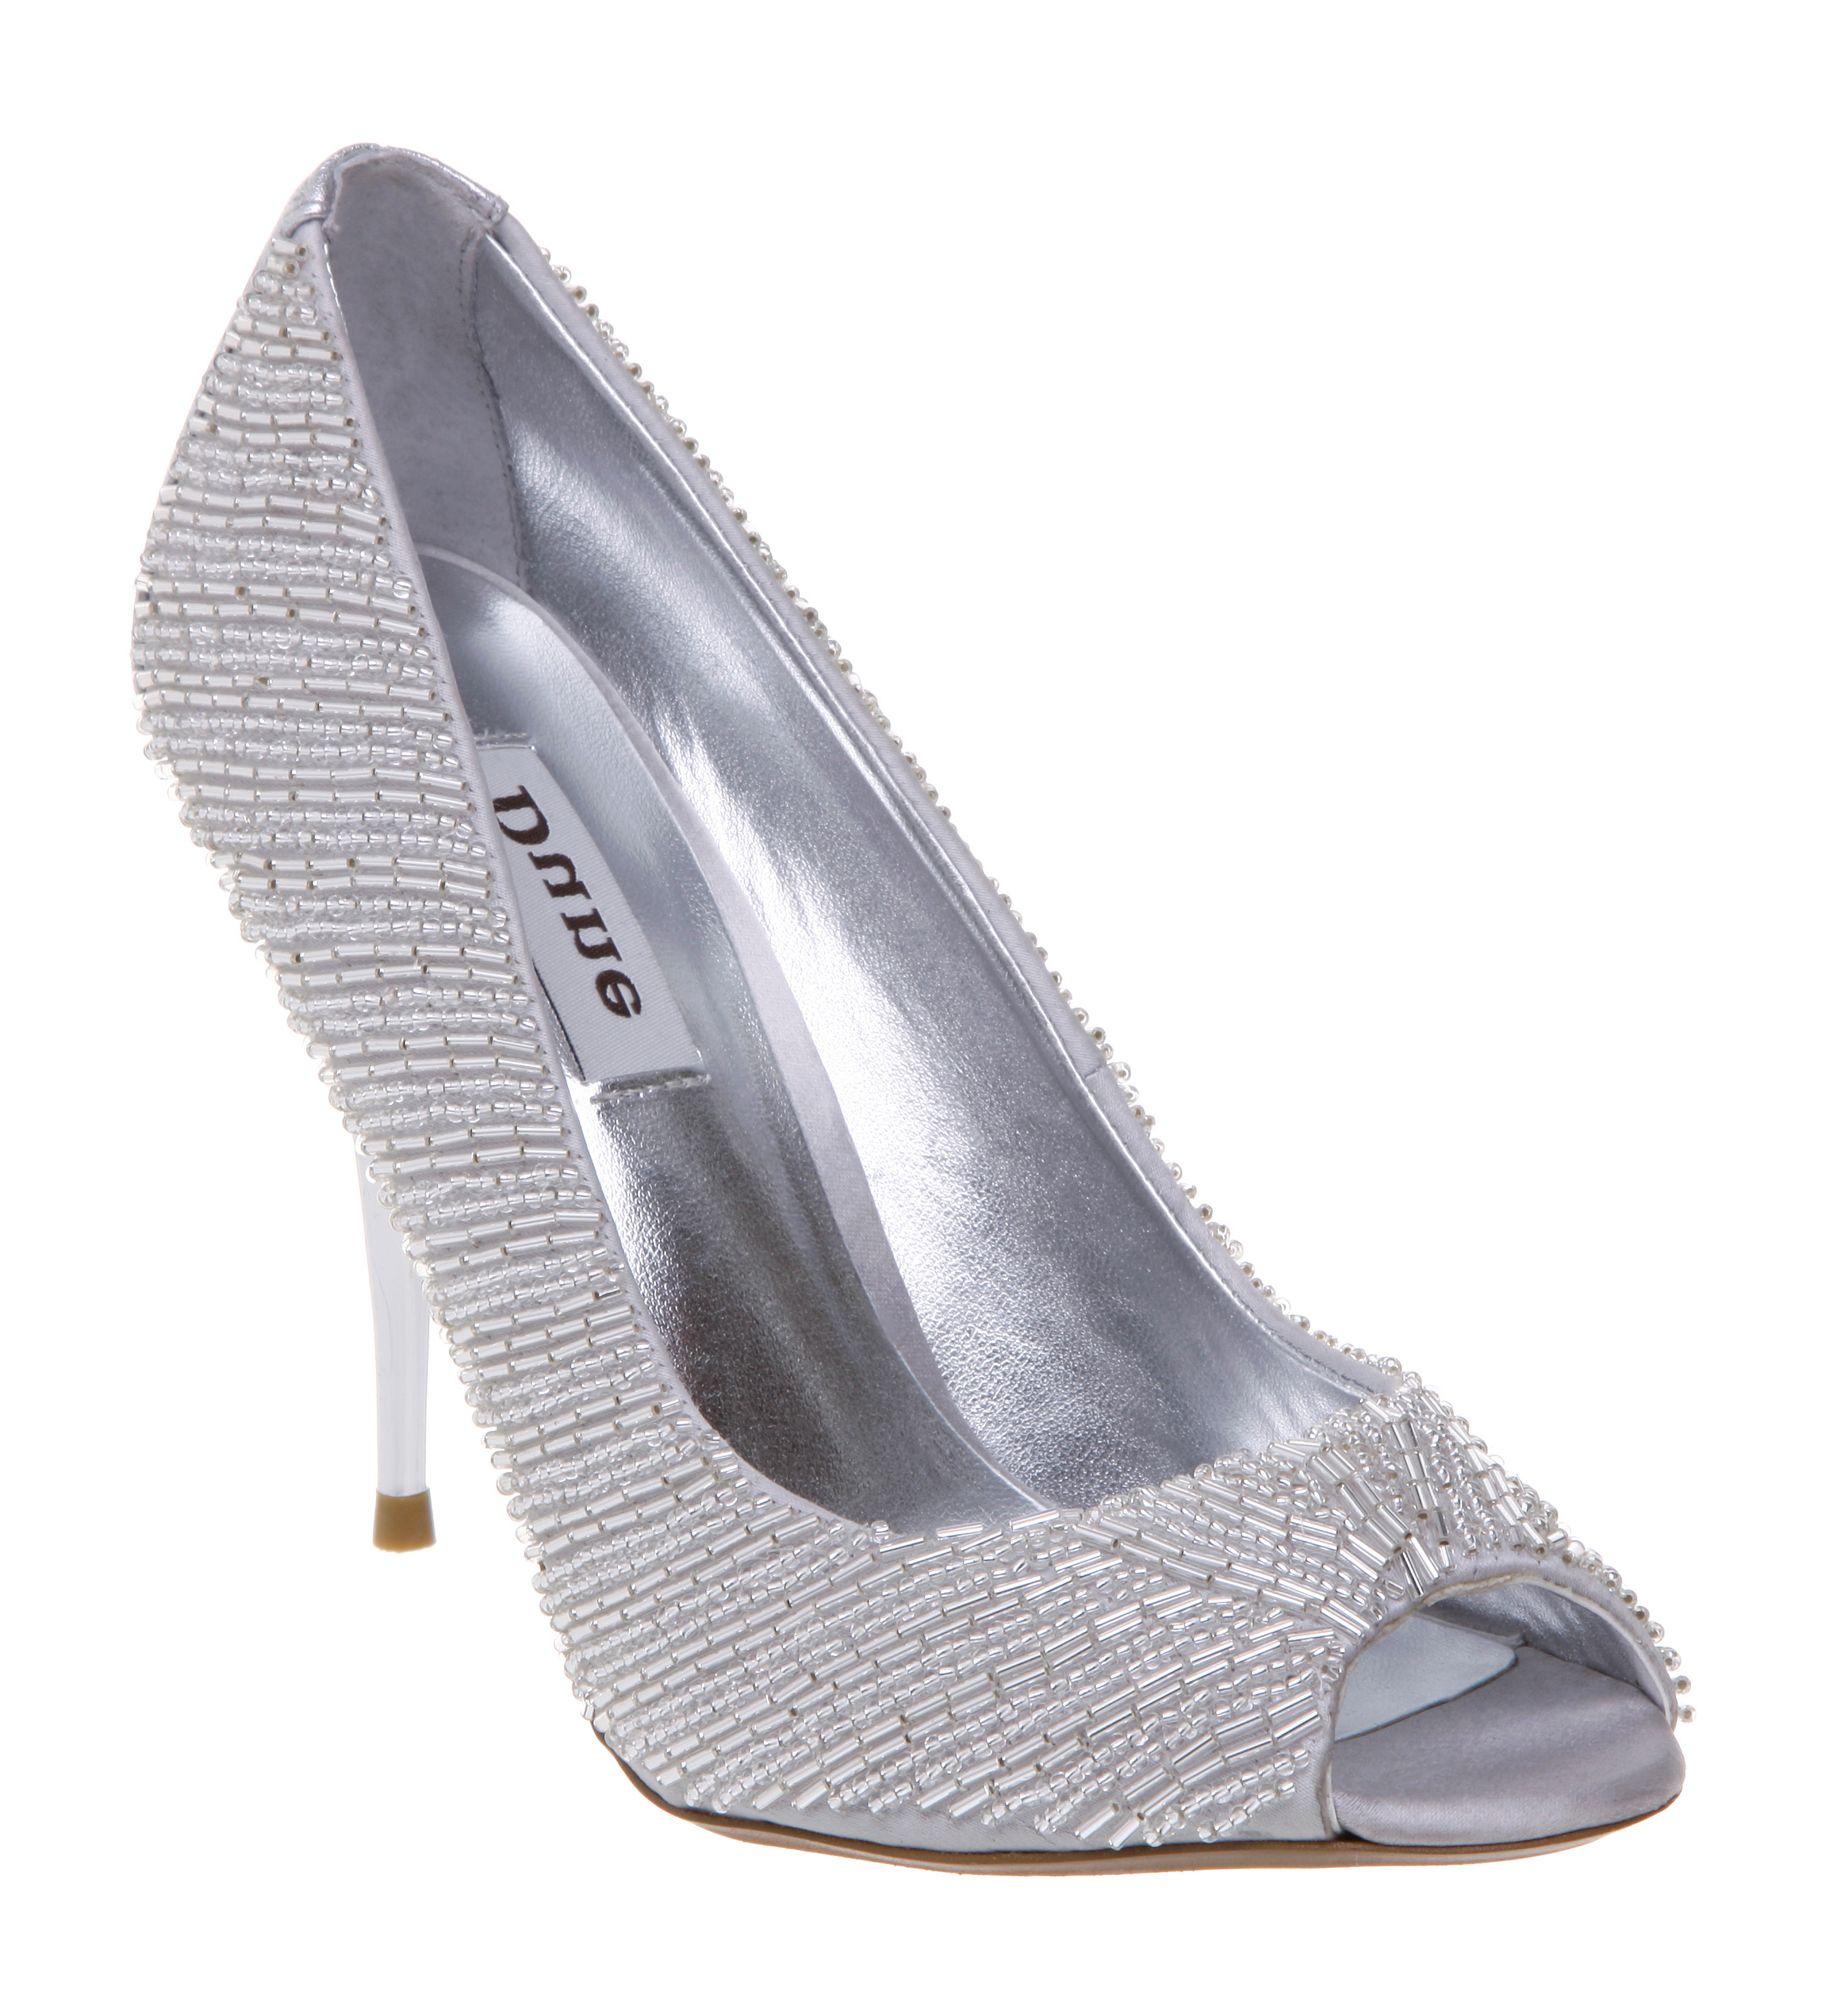 Dune Vivian Peep Toe Beaded Court Shoes in Gray